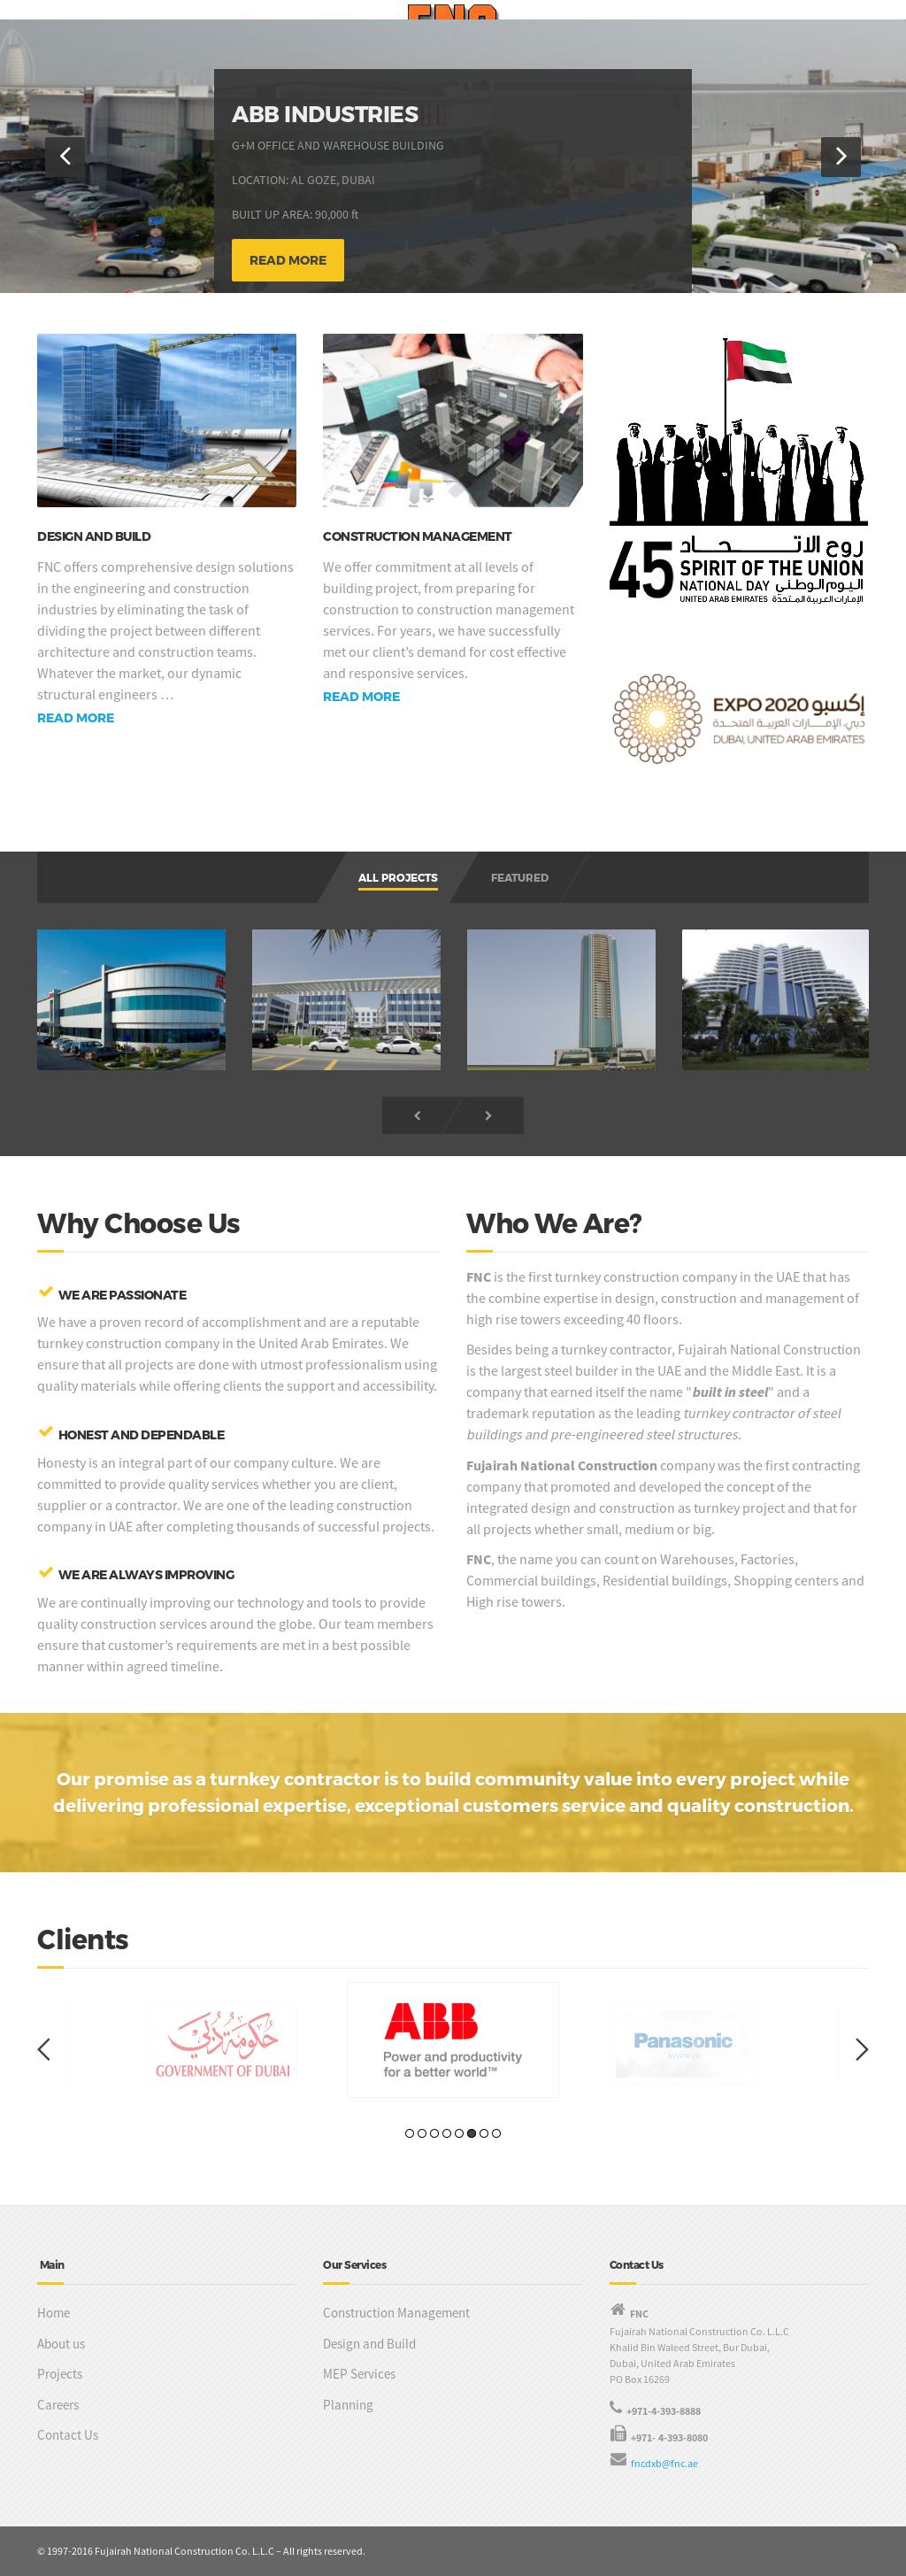 Fujairah National Construction Competitors, Revenue and